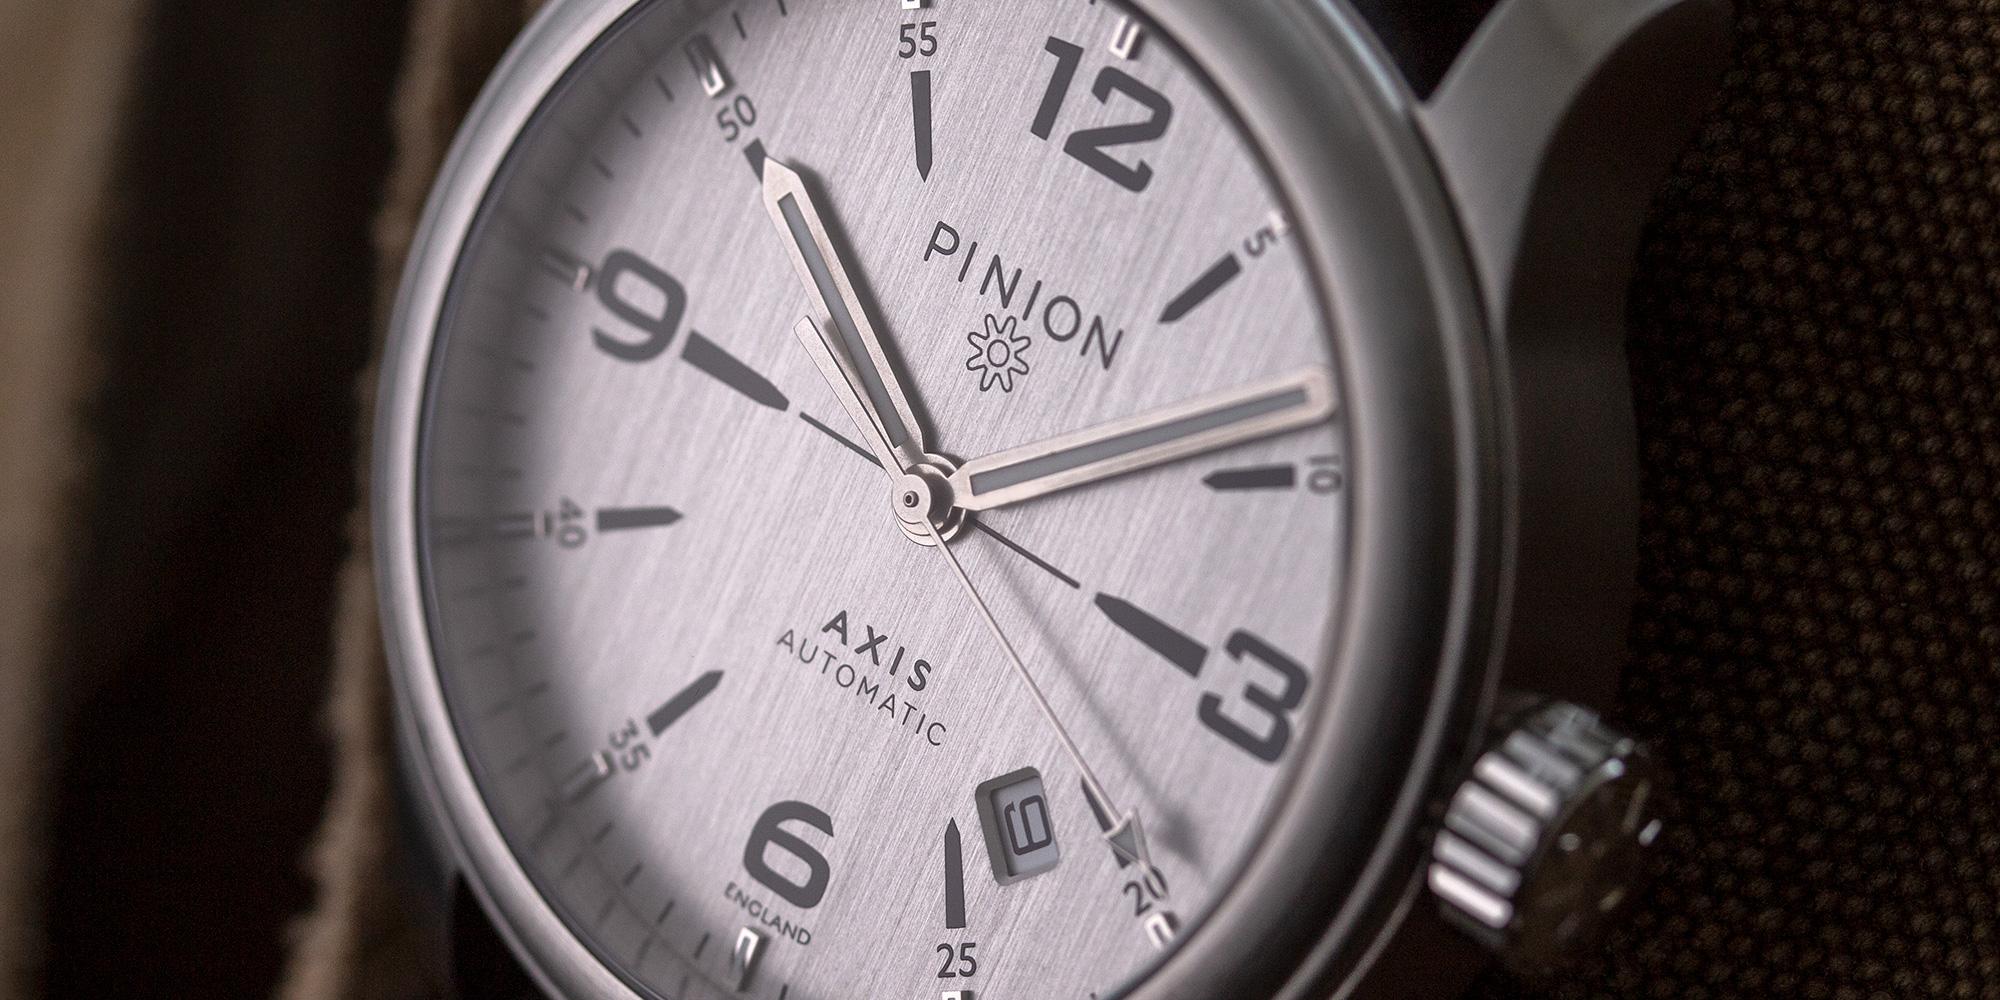 pinion-axis-ii-steel-silver-watch-003